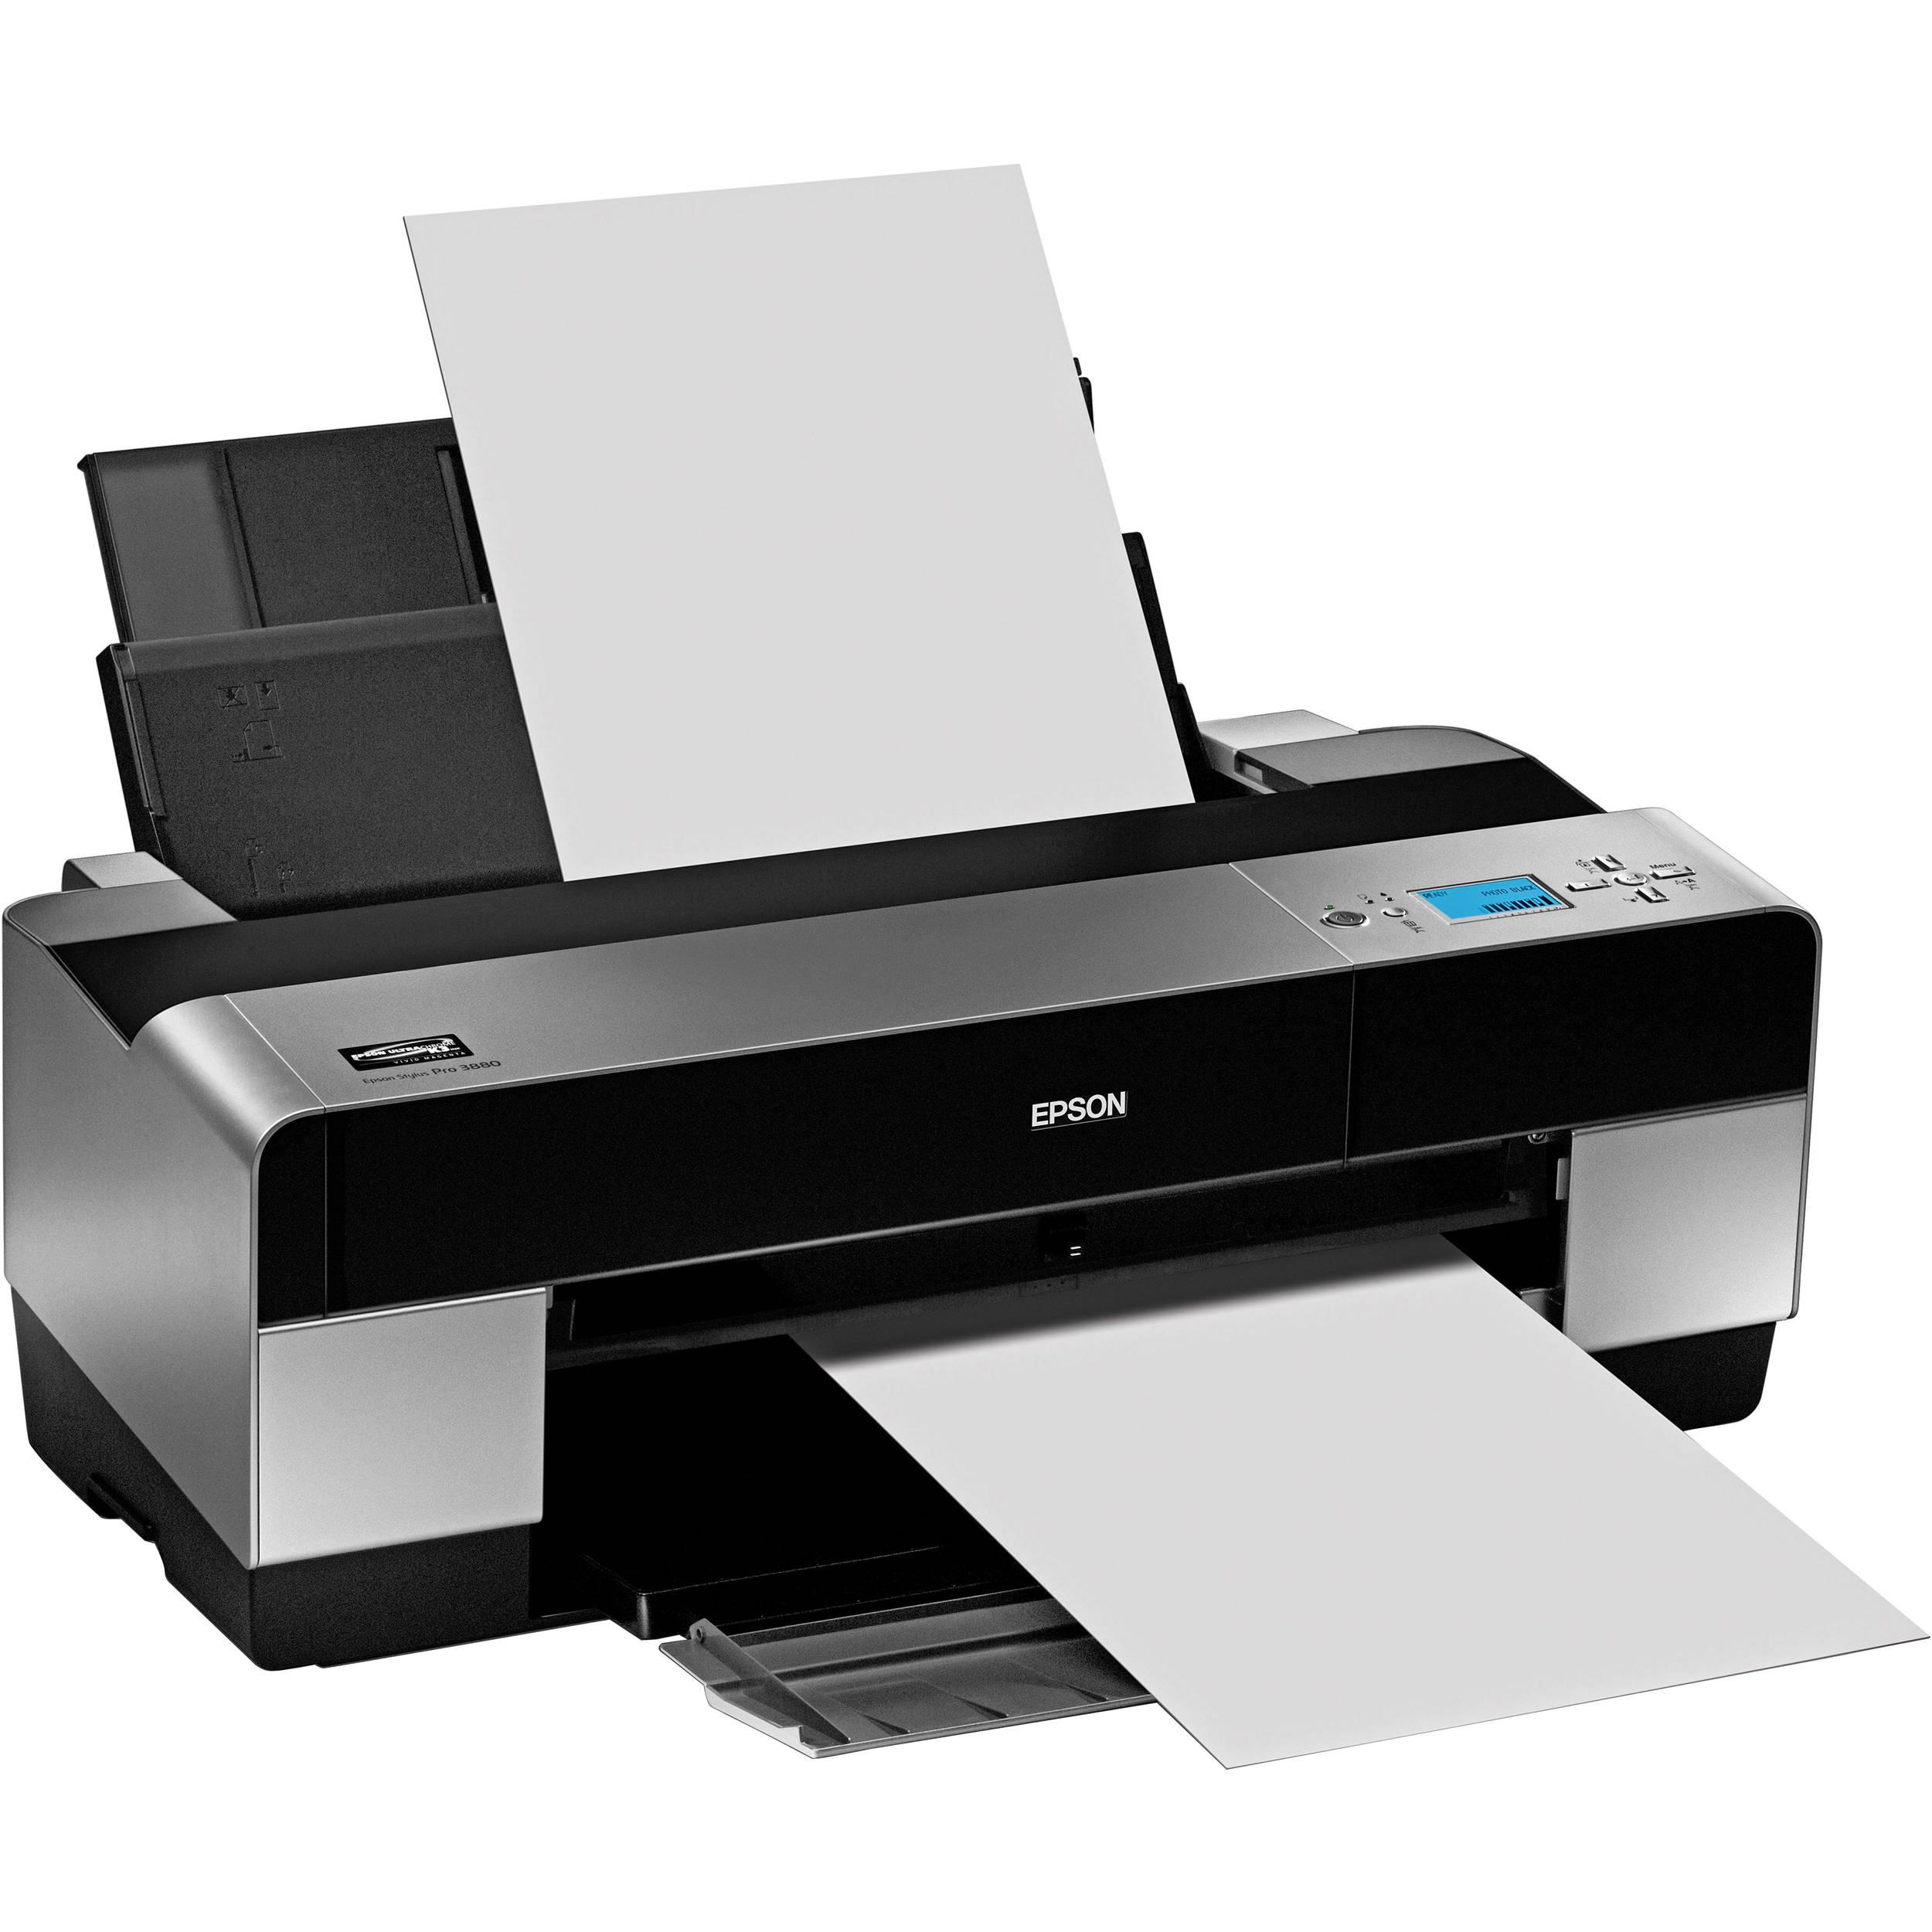 epson stylus pro 3880 large format inkjet printer ca61201 ga b h. Black Bedroom Furniture Sets. Home Design Ideas